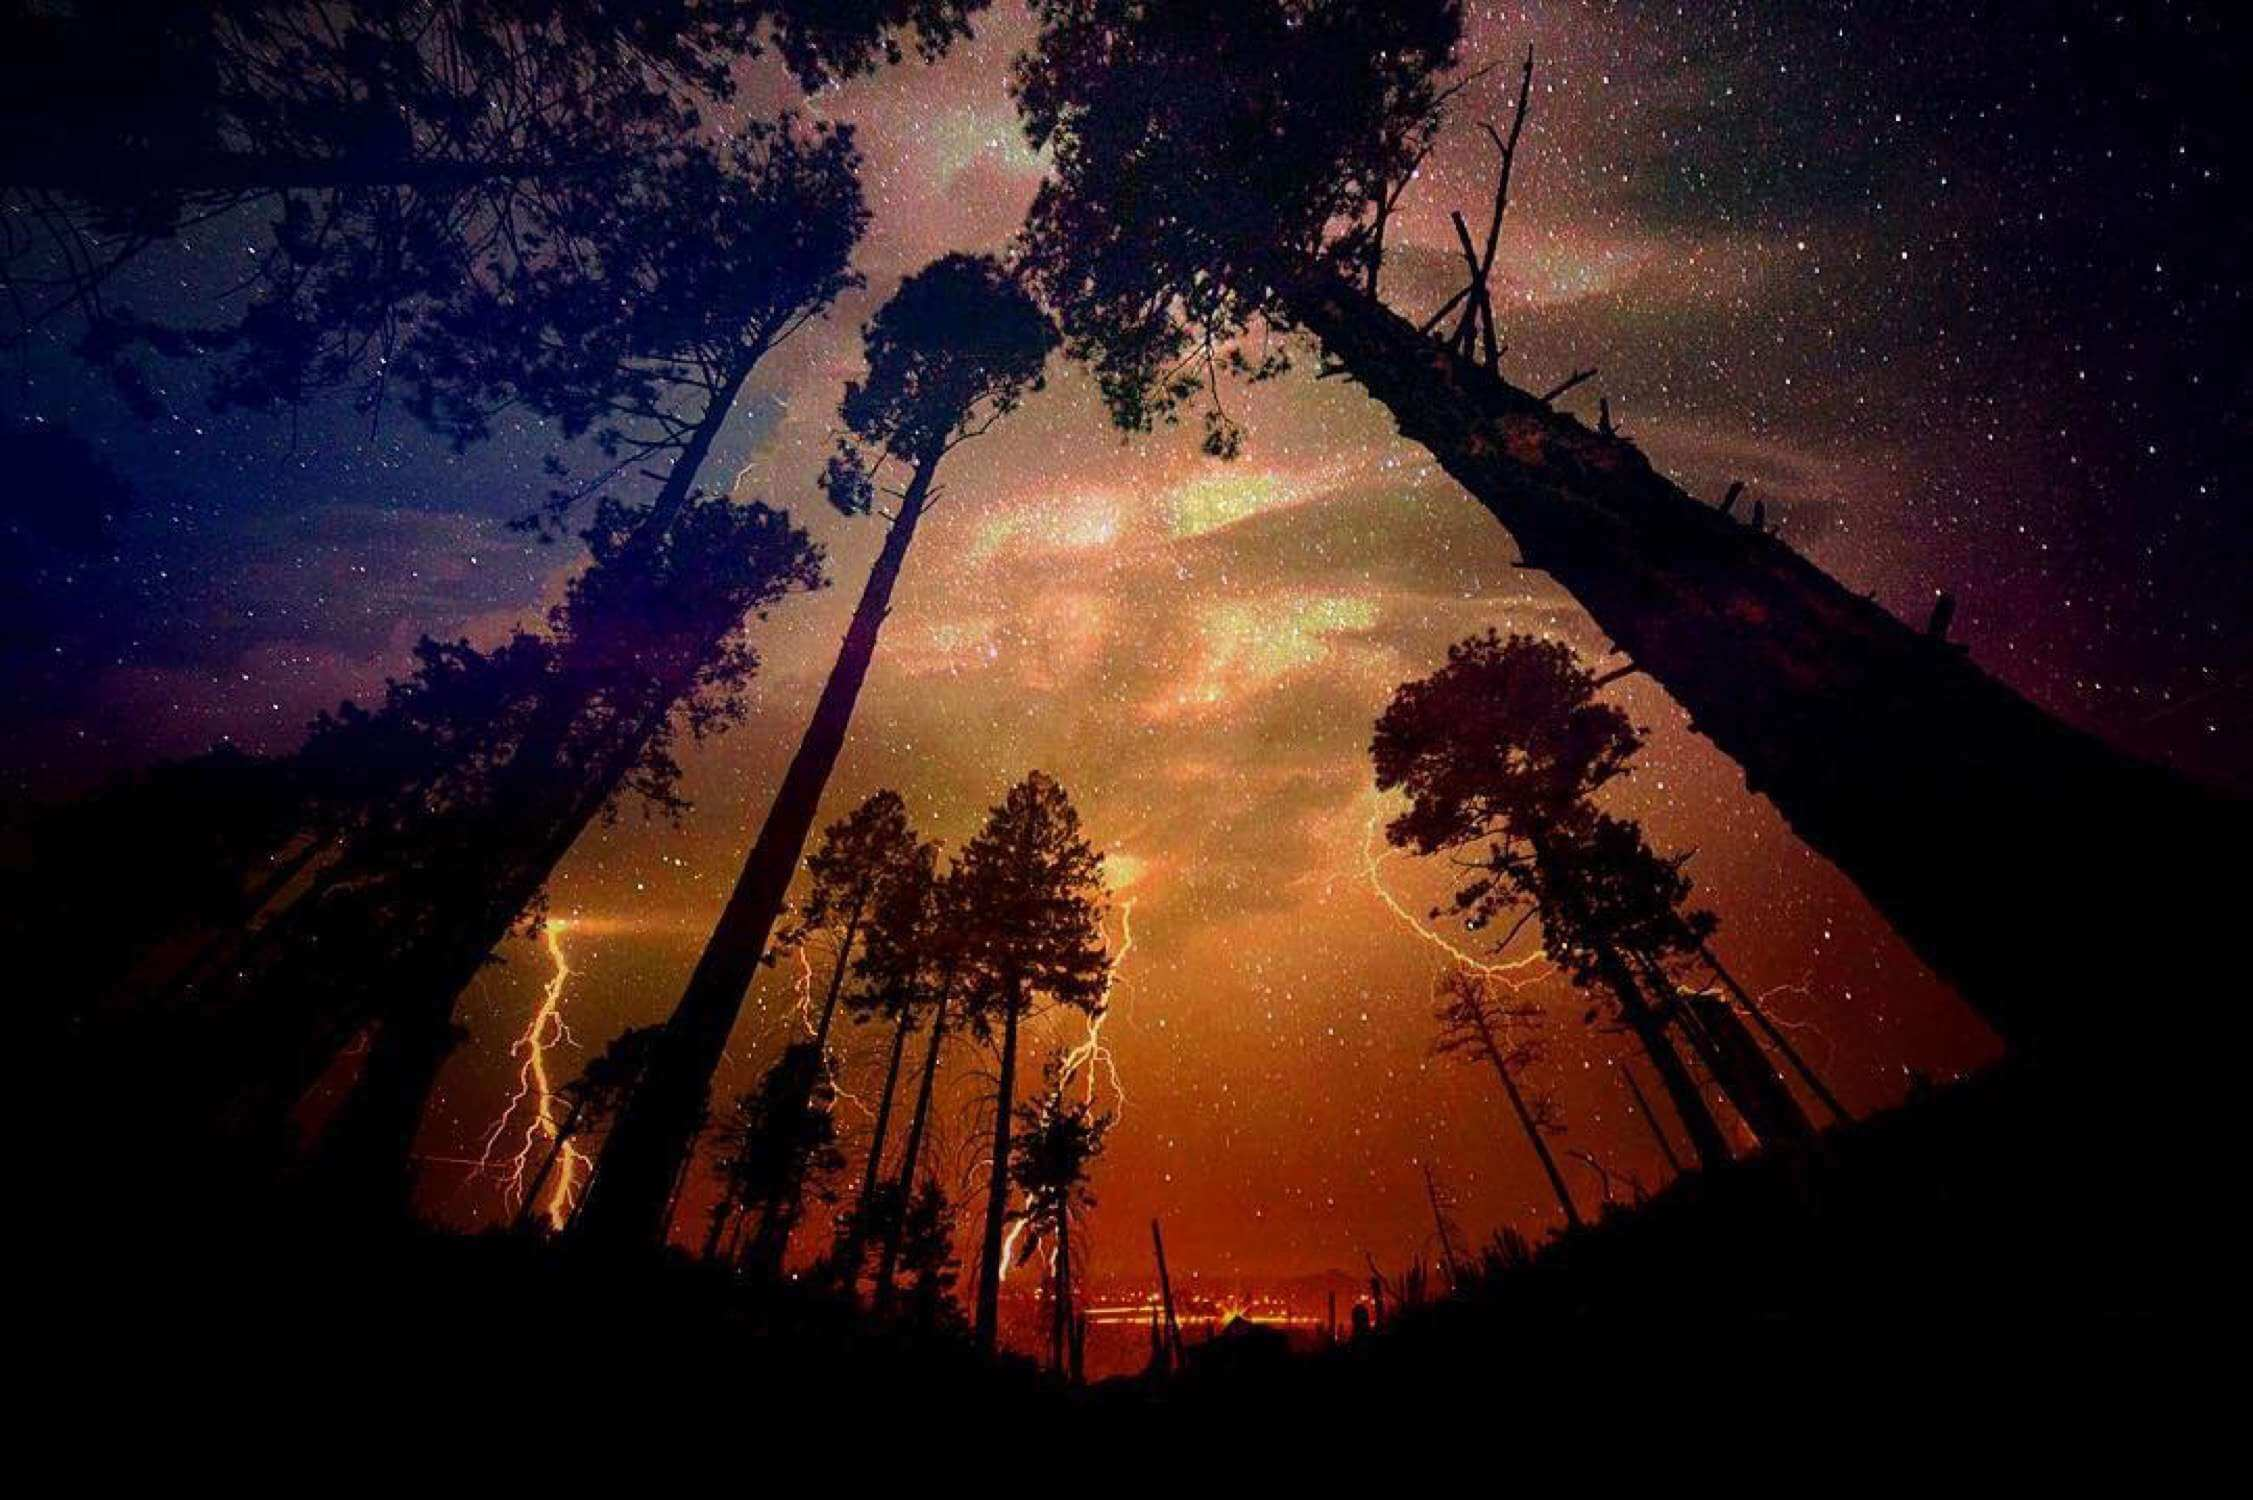 ospreypics - DMAURKG